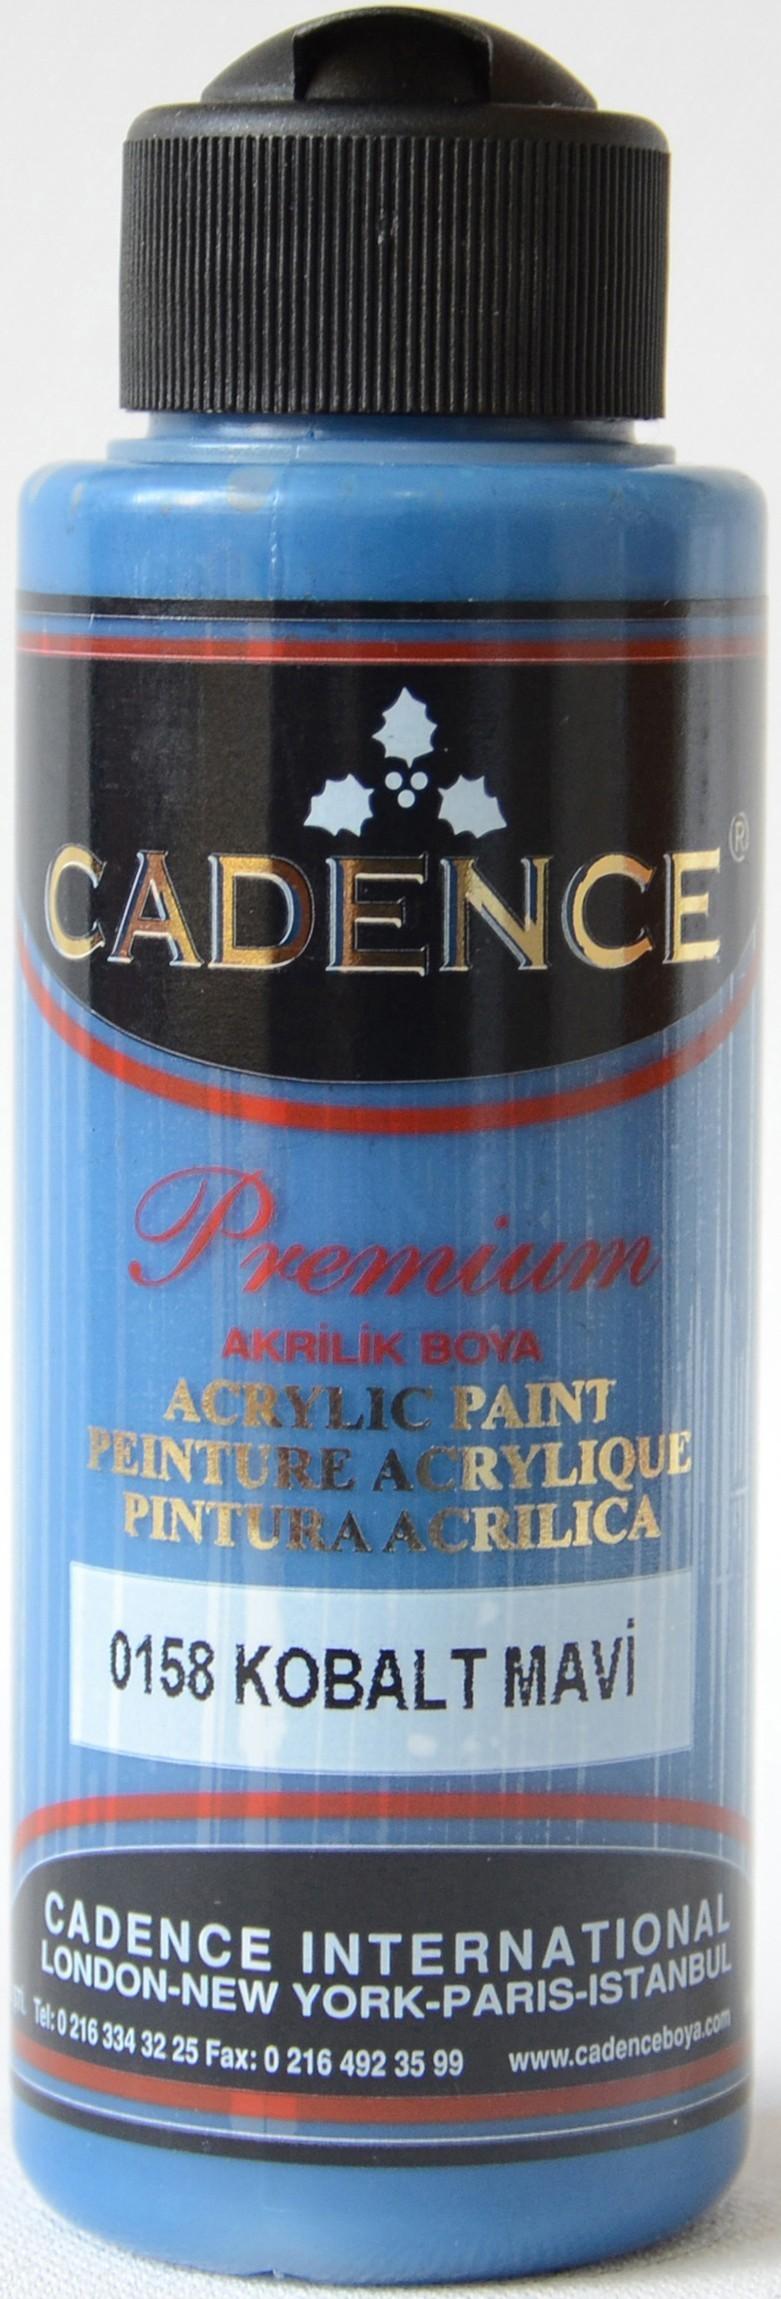 Cadence Akrilik Boya 120ML(cc) 0158 Kobalt Mavi